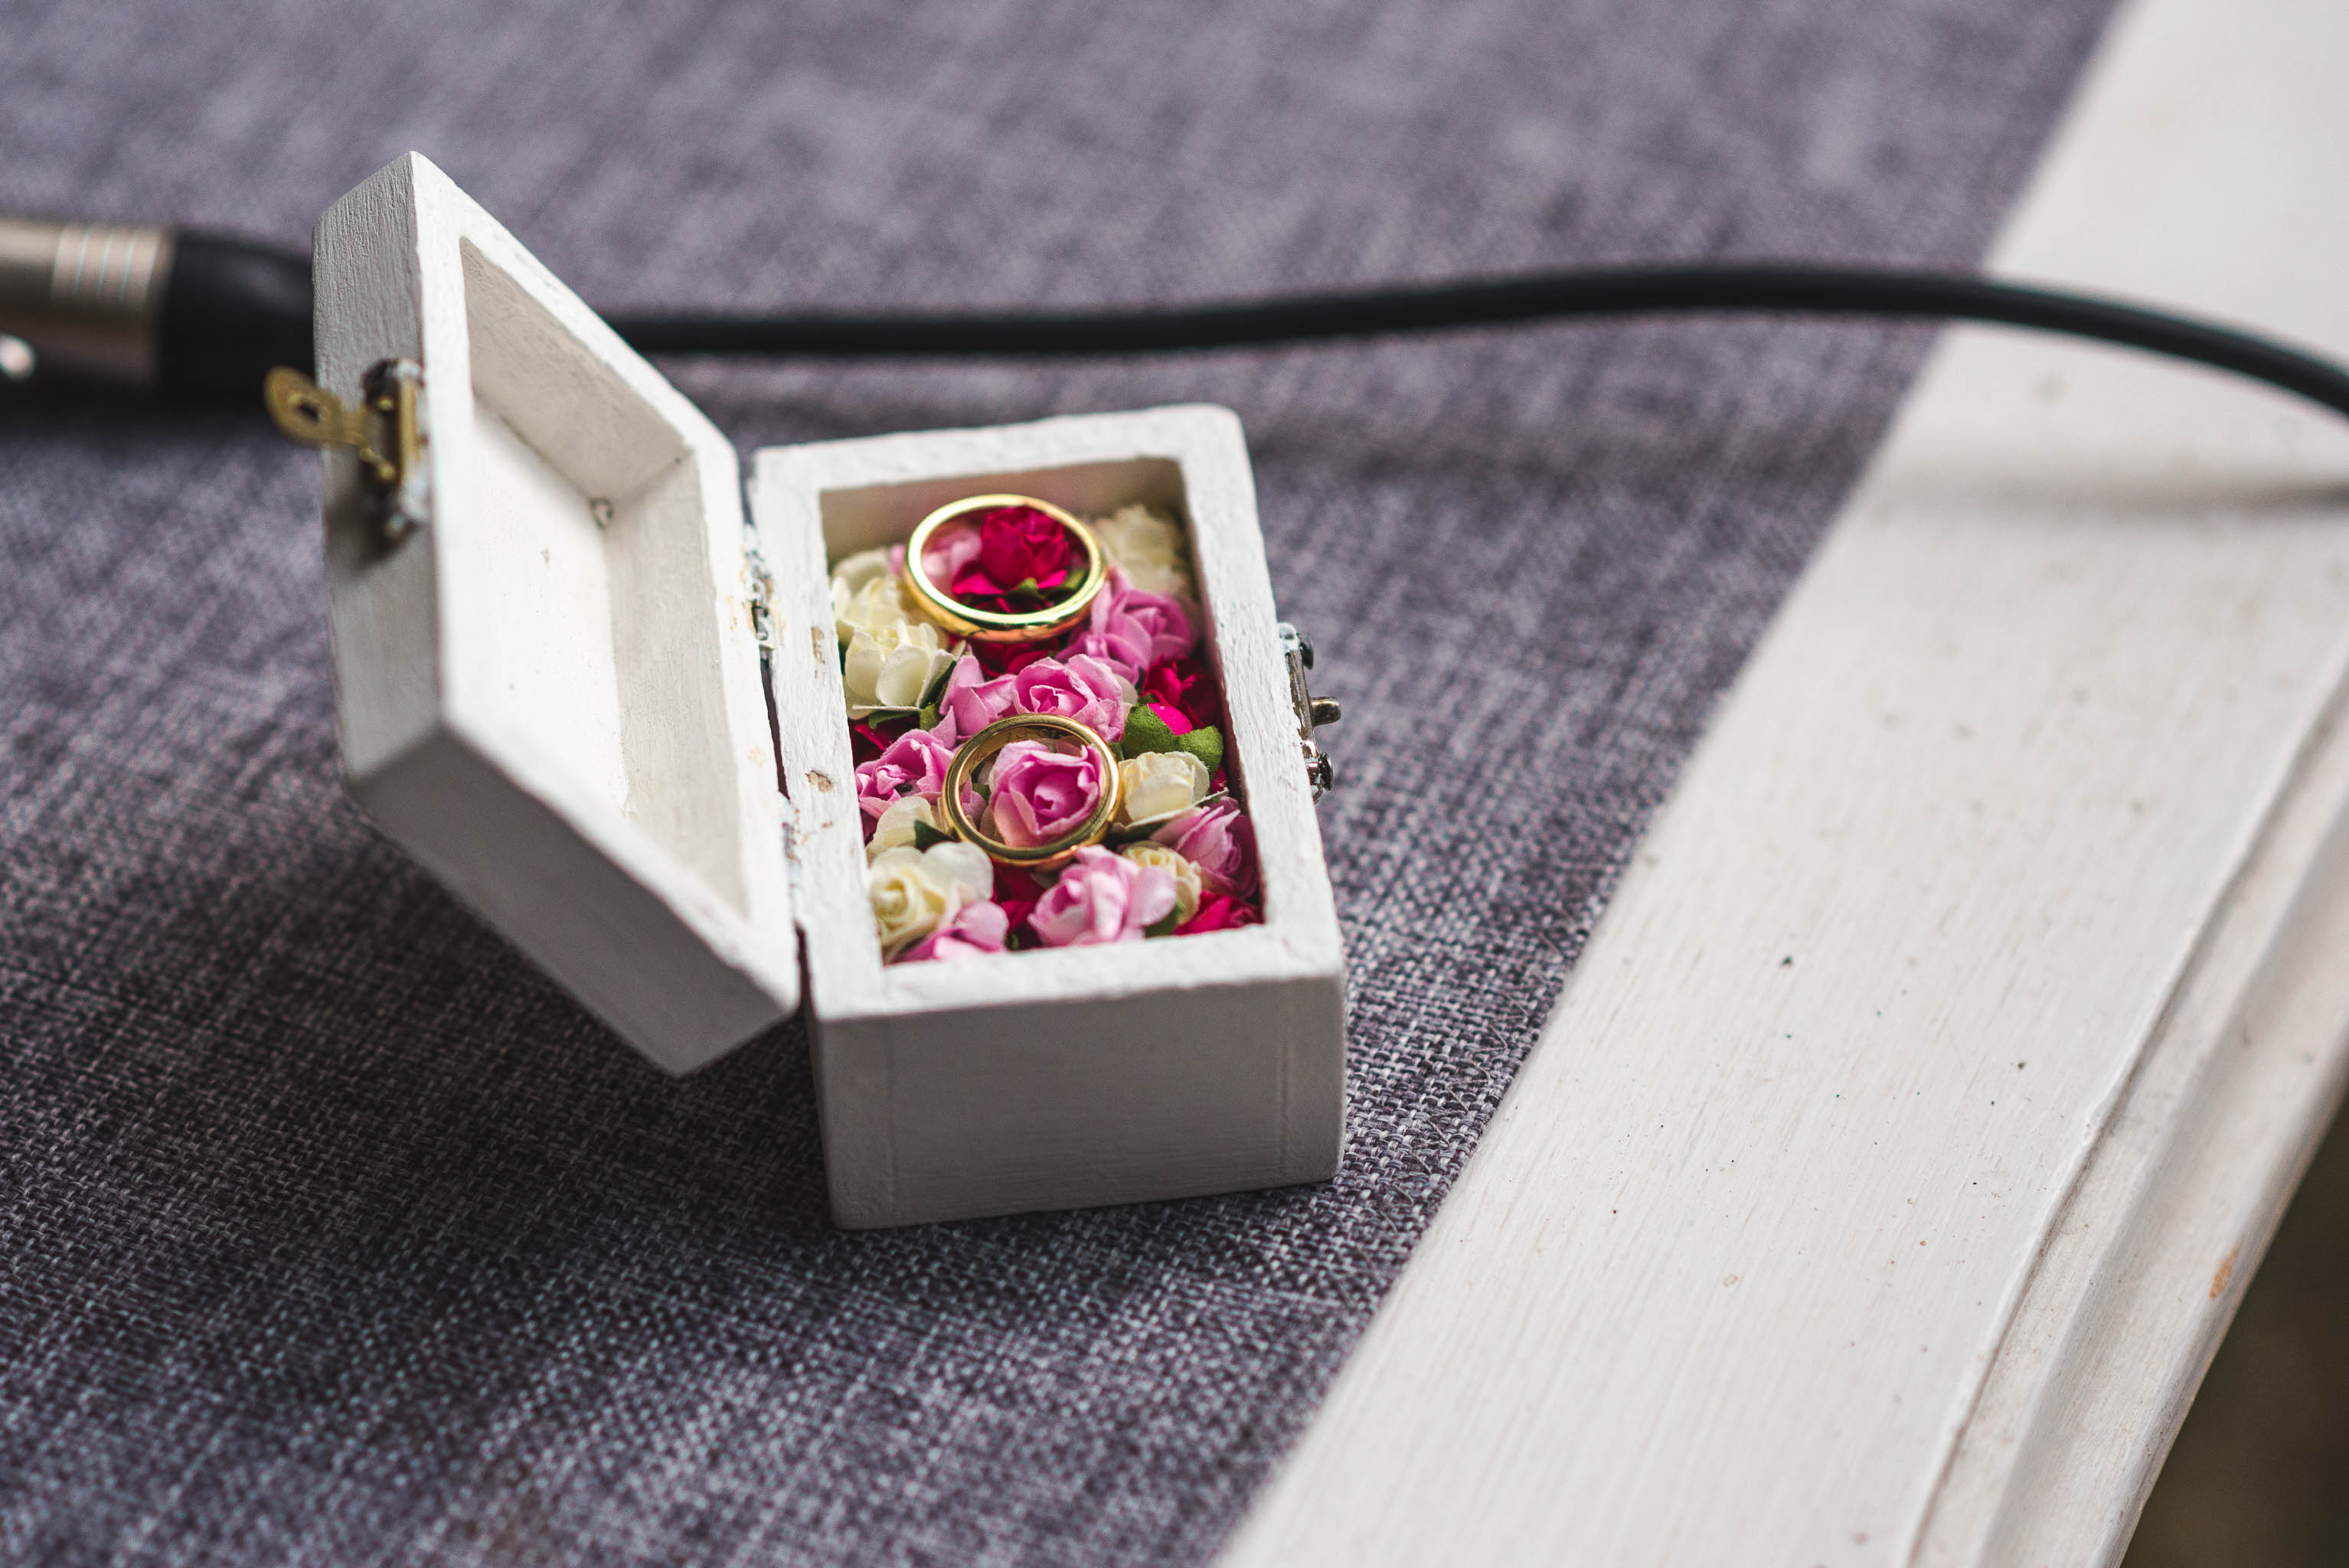 fotografo documental de matrimonios-fotografo matrimonio santiago-ceremonia-anillos de novios